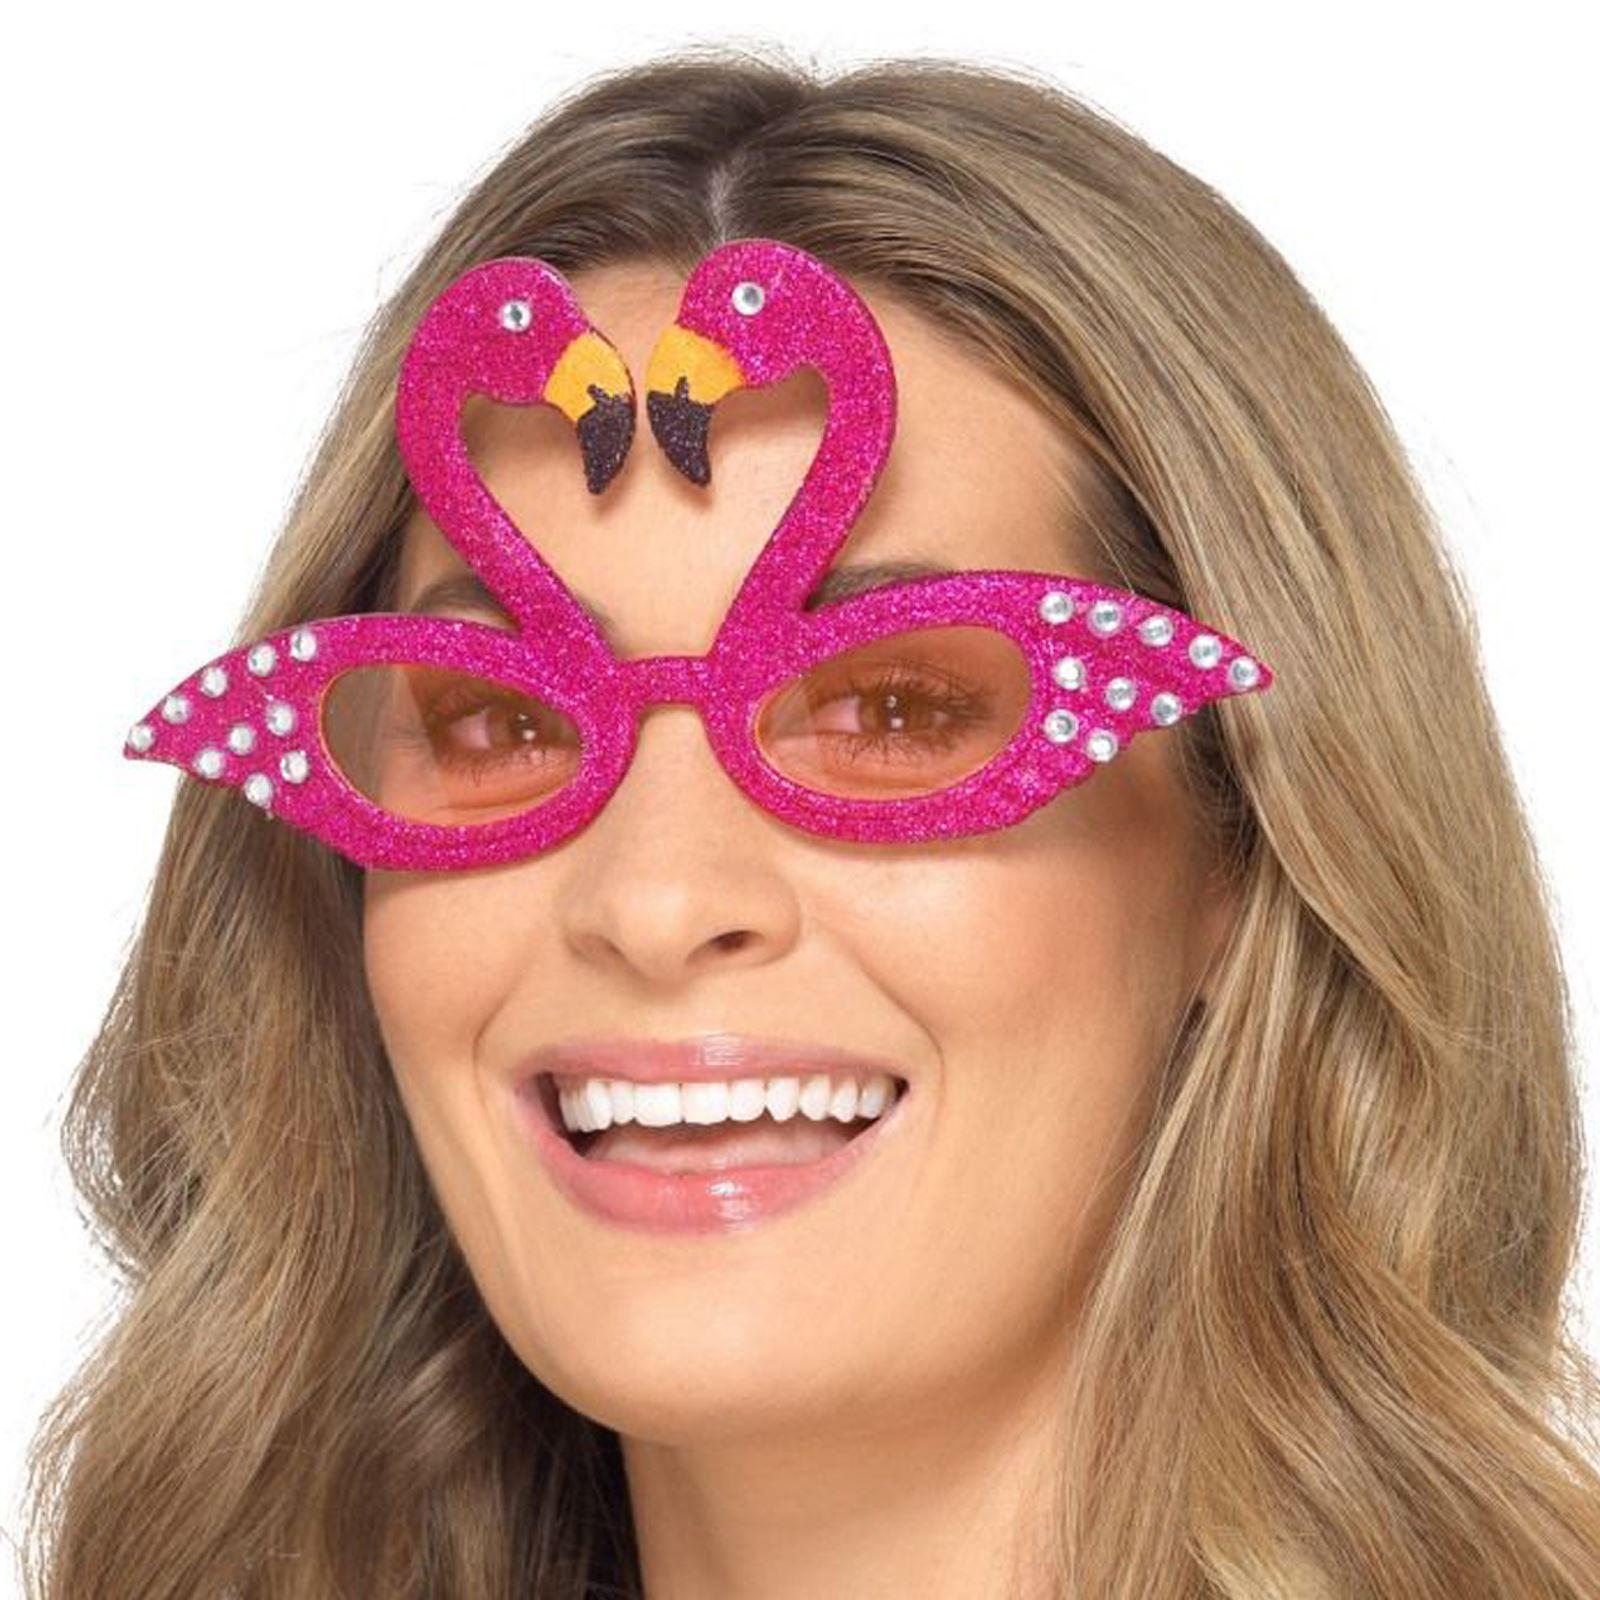 Blesiya Glitter Flamingo Glasses Sunglasses Hawaiian Beach Fun Party Costume